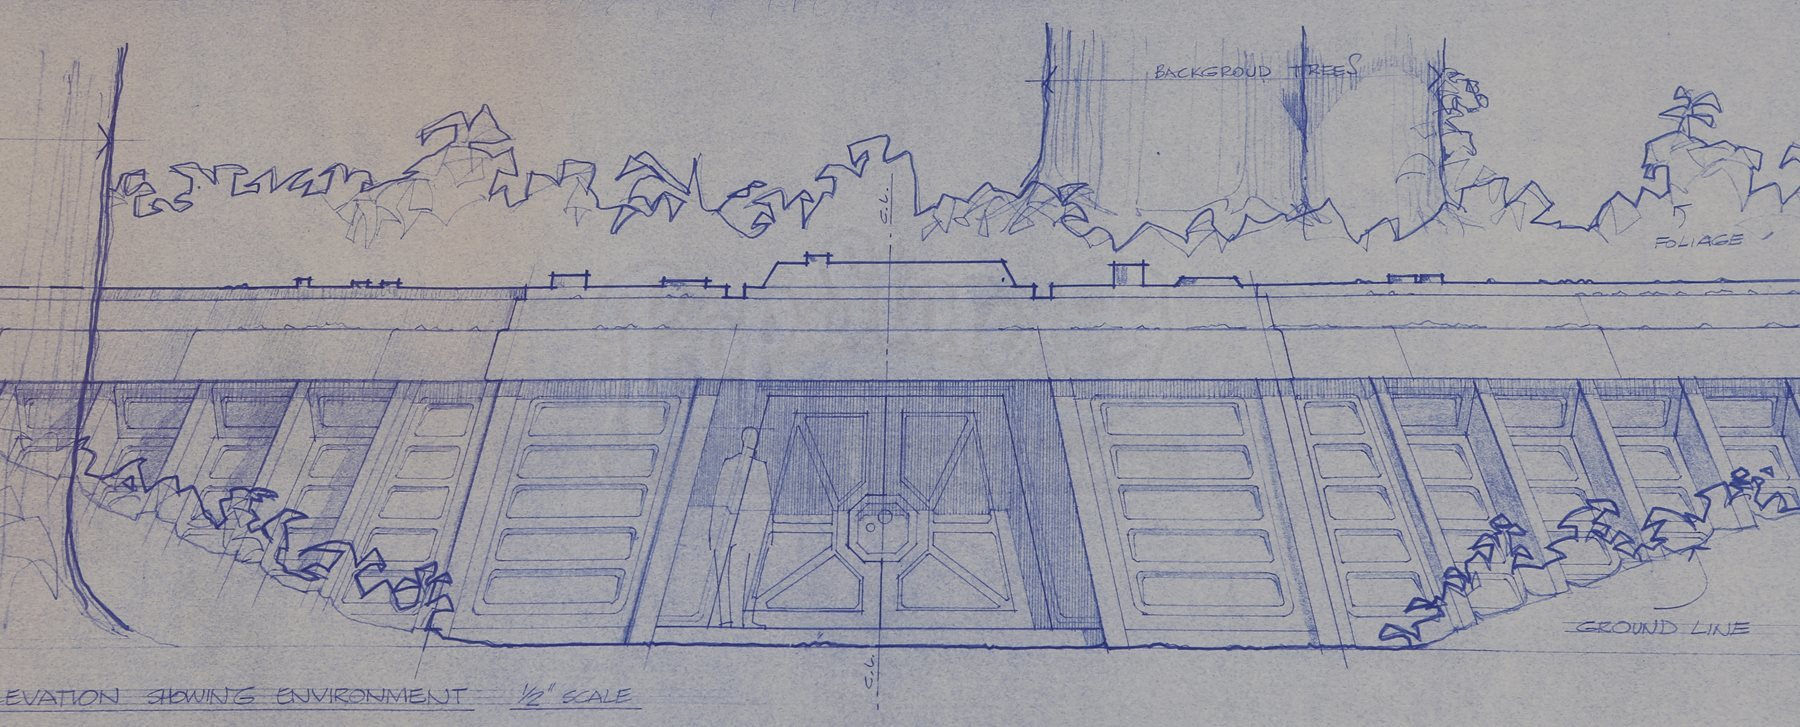 Star wars ep vi return of the jedi bunker site plan section lot 67 malvernweather Choice Image